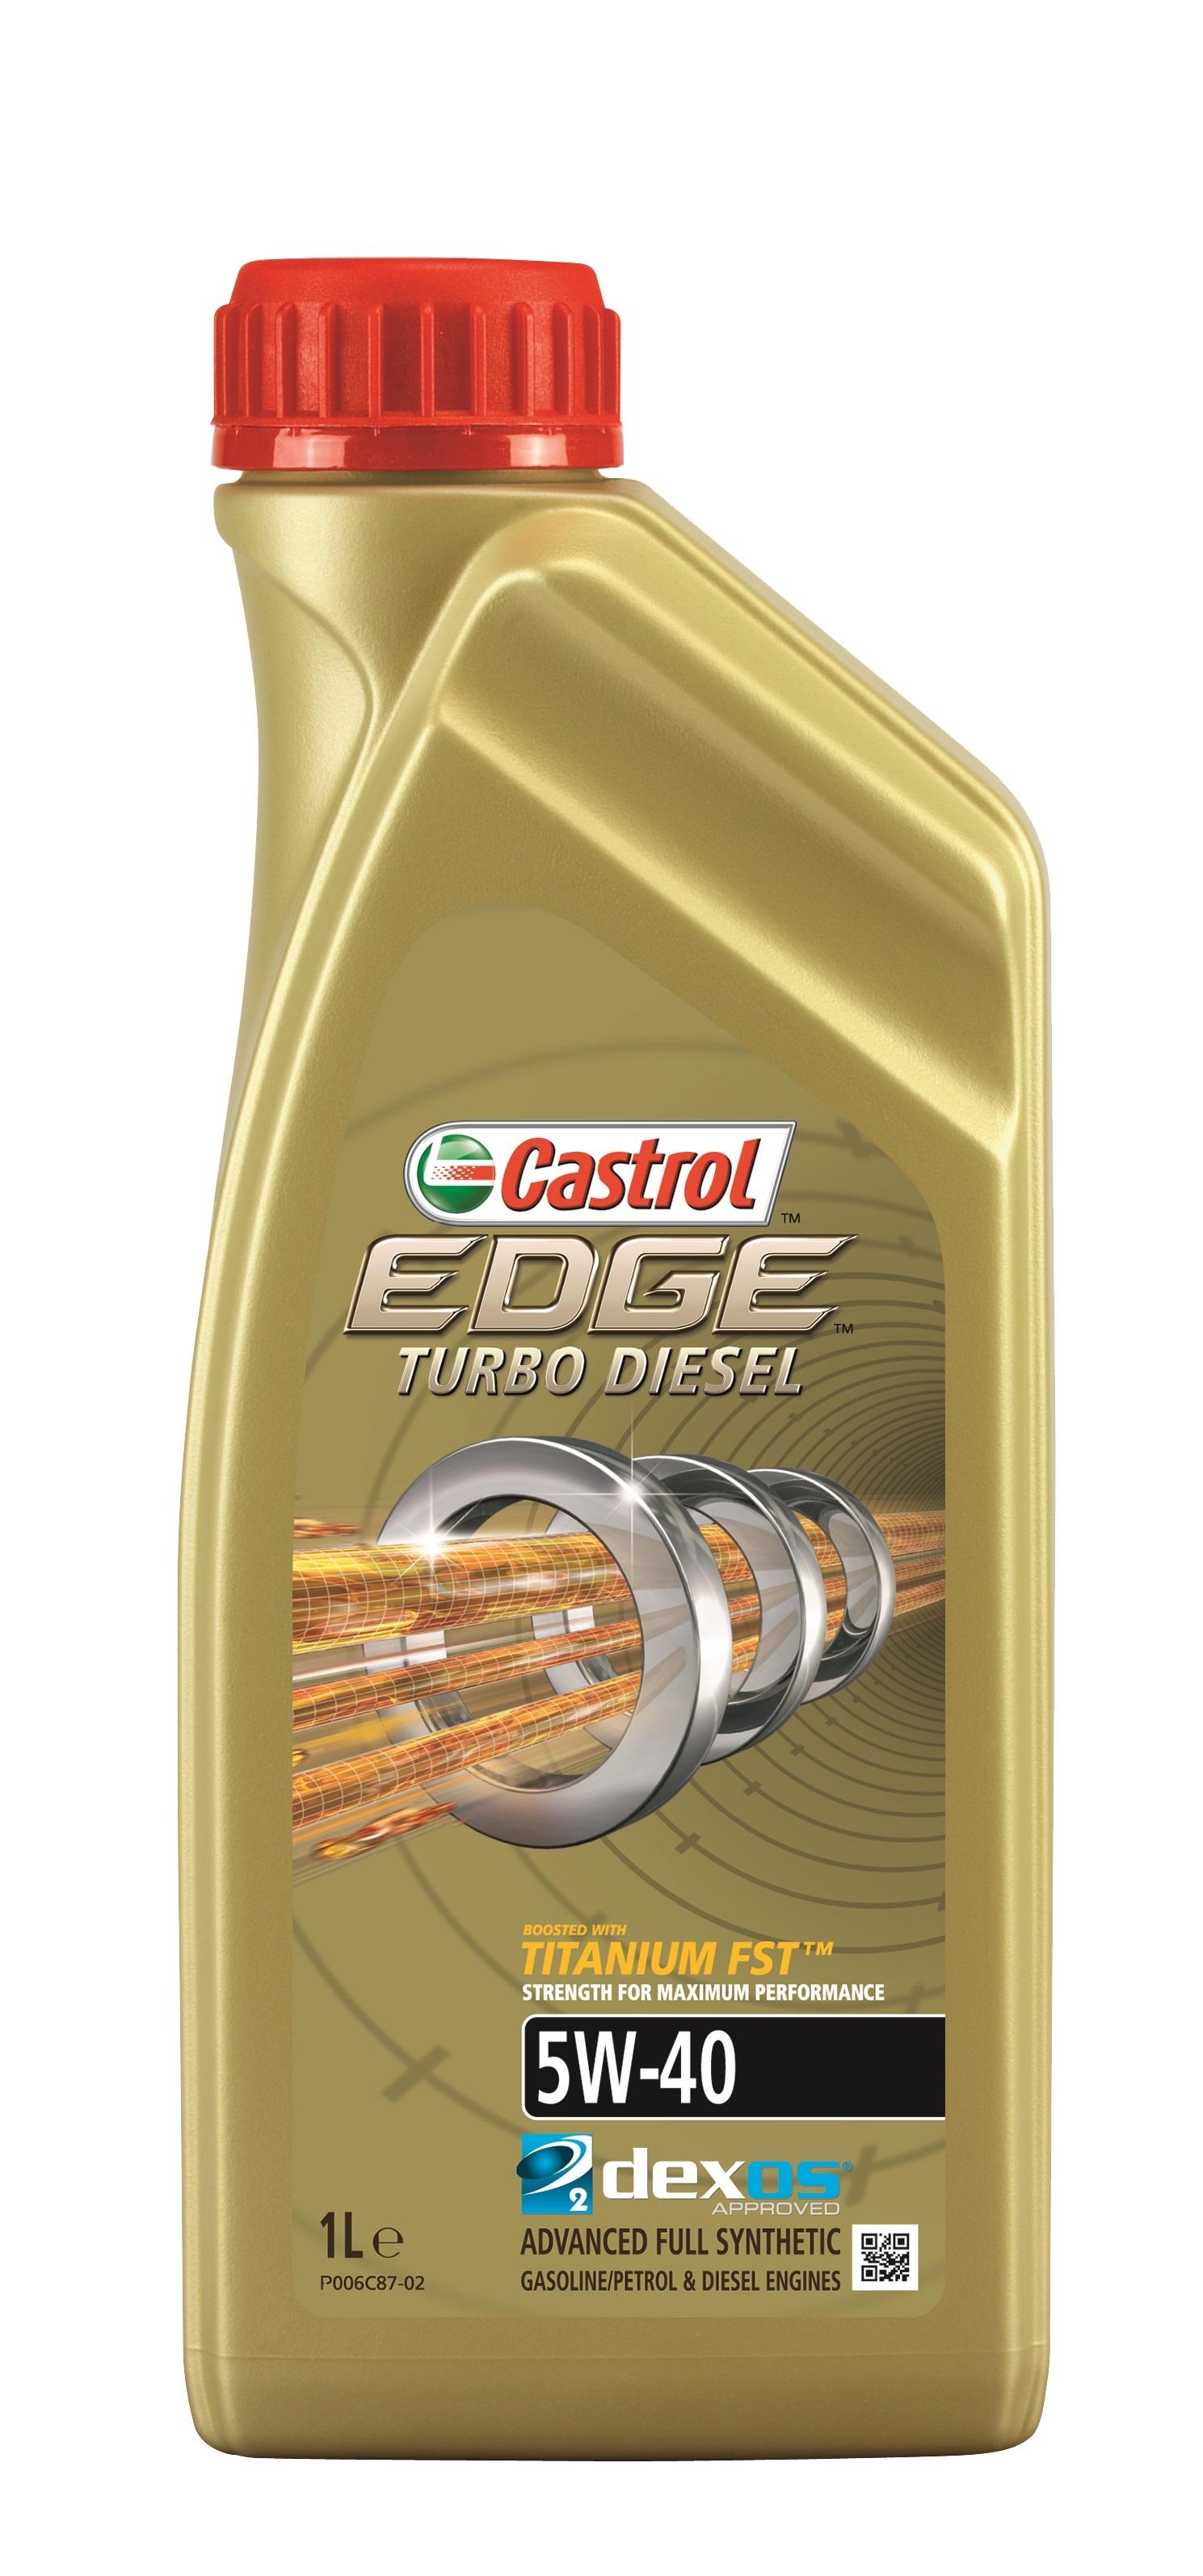 Моторное масло Castrol Edge Turbo Diesel 5W-40 1л